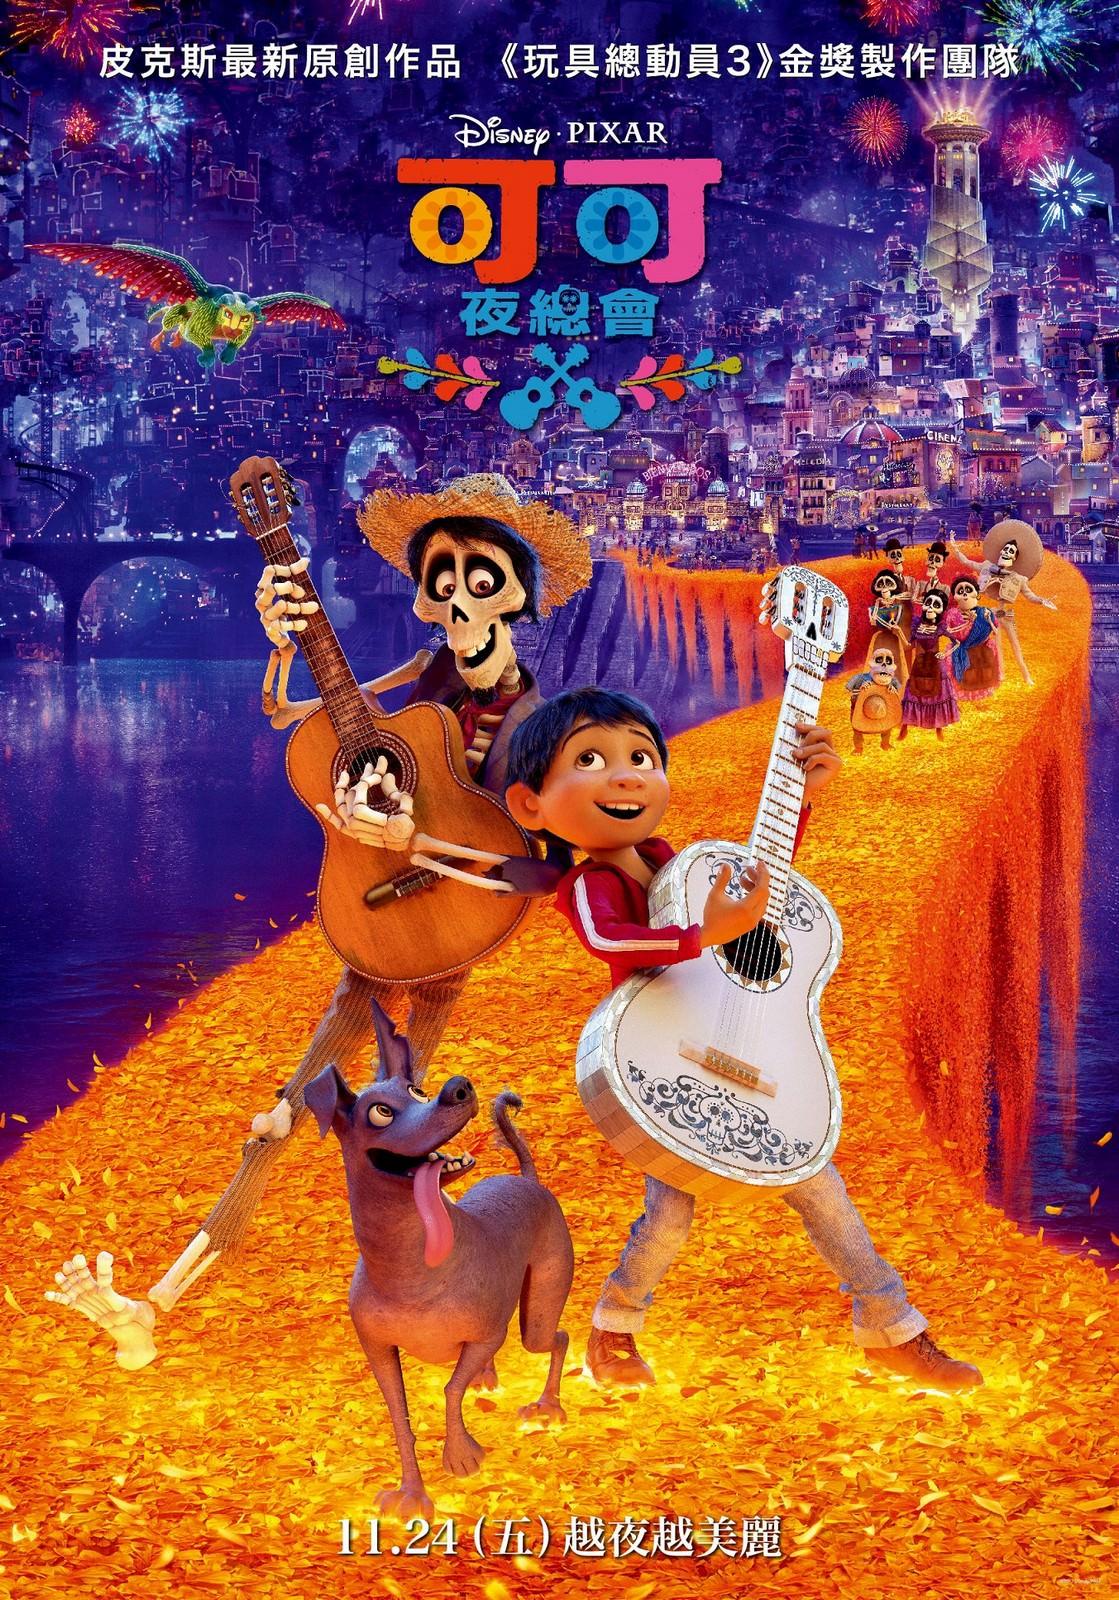 Movie, Coco(美國, 2017年) / 可可夜總會(台灣) / 寻梦环游记(中國) / 玩轉極樂園(香港), 電影海報, 台灣